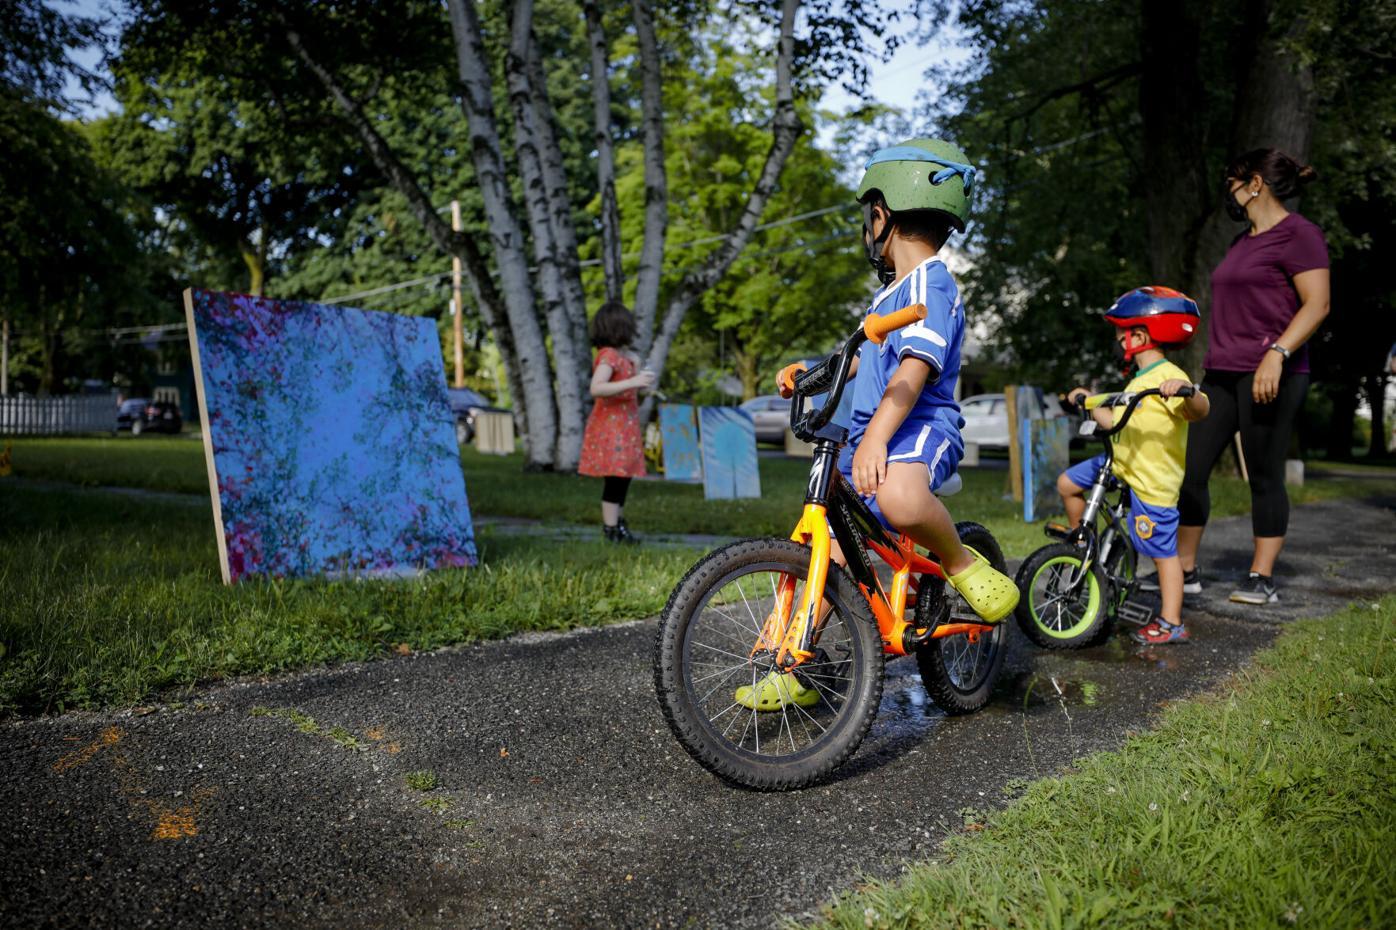 Kids on bikes look at art